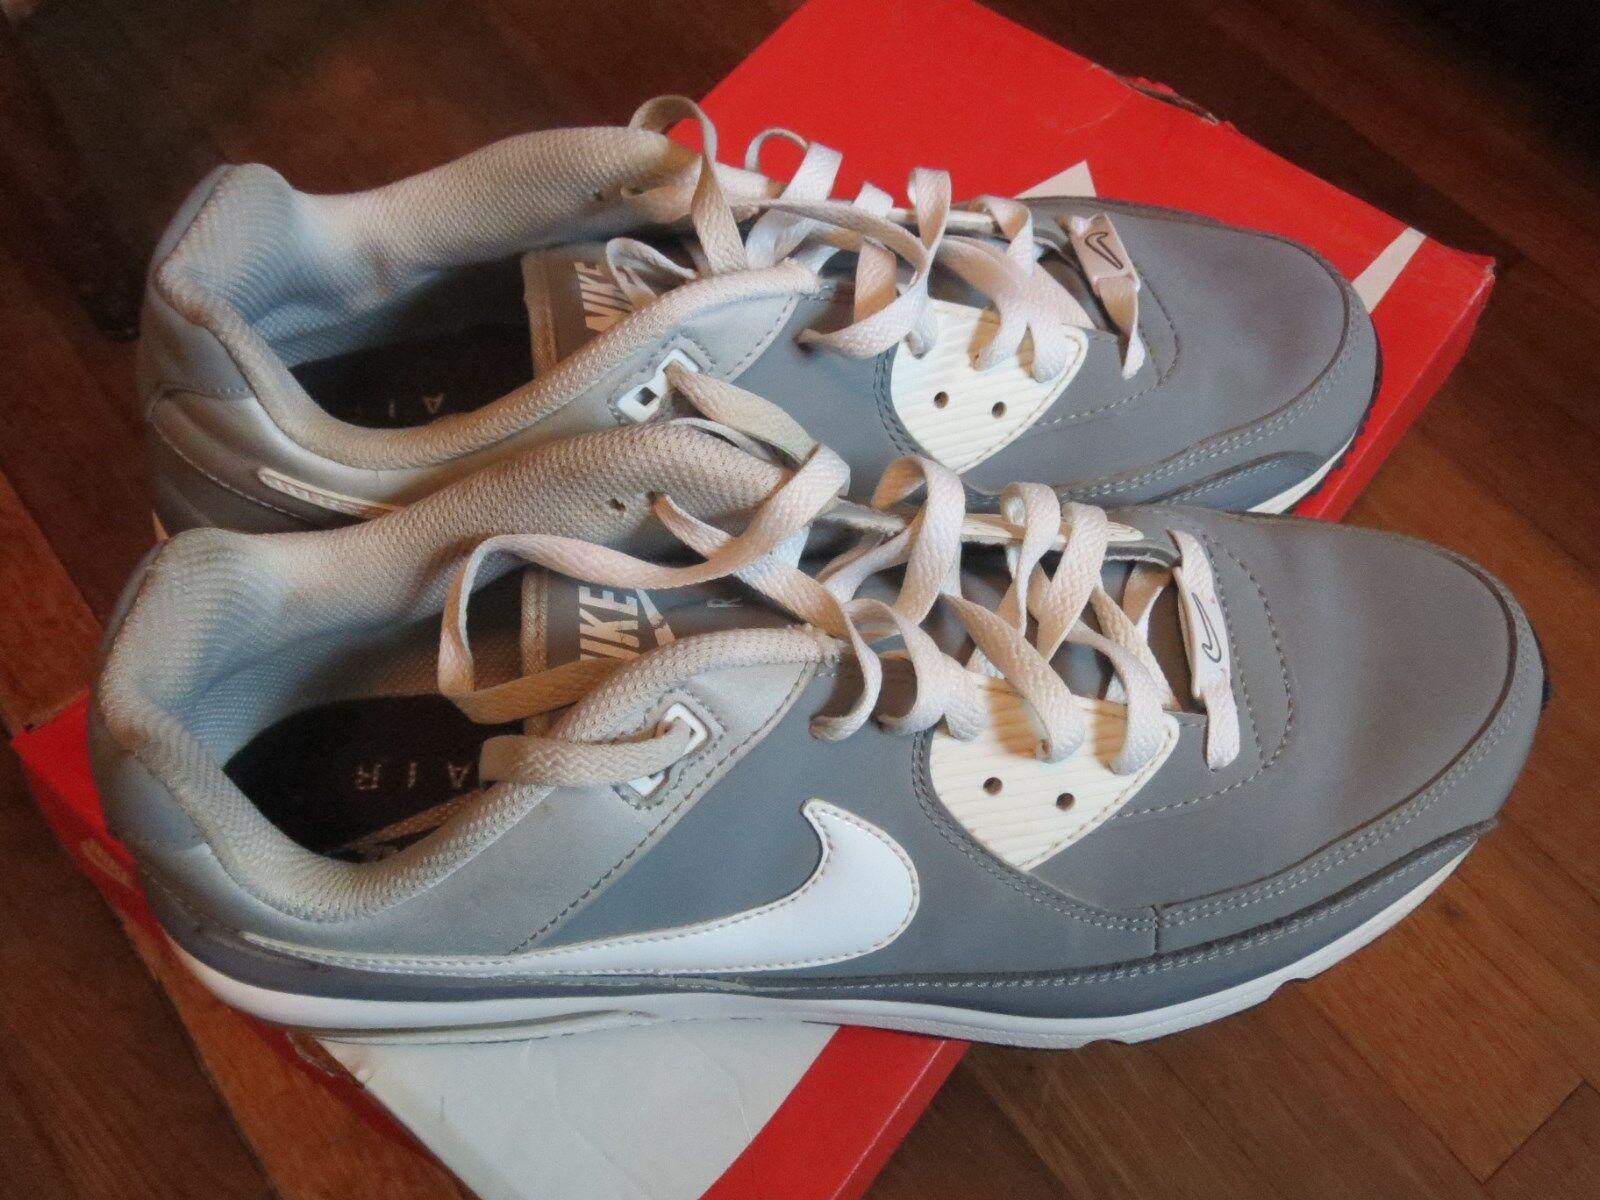 Nike air max pacfly größe - 13 - schwarz / kühlen grau - größe 707319 001